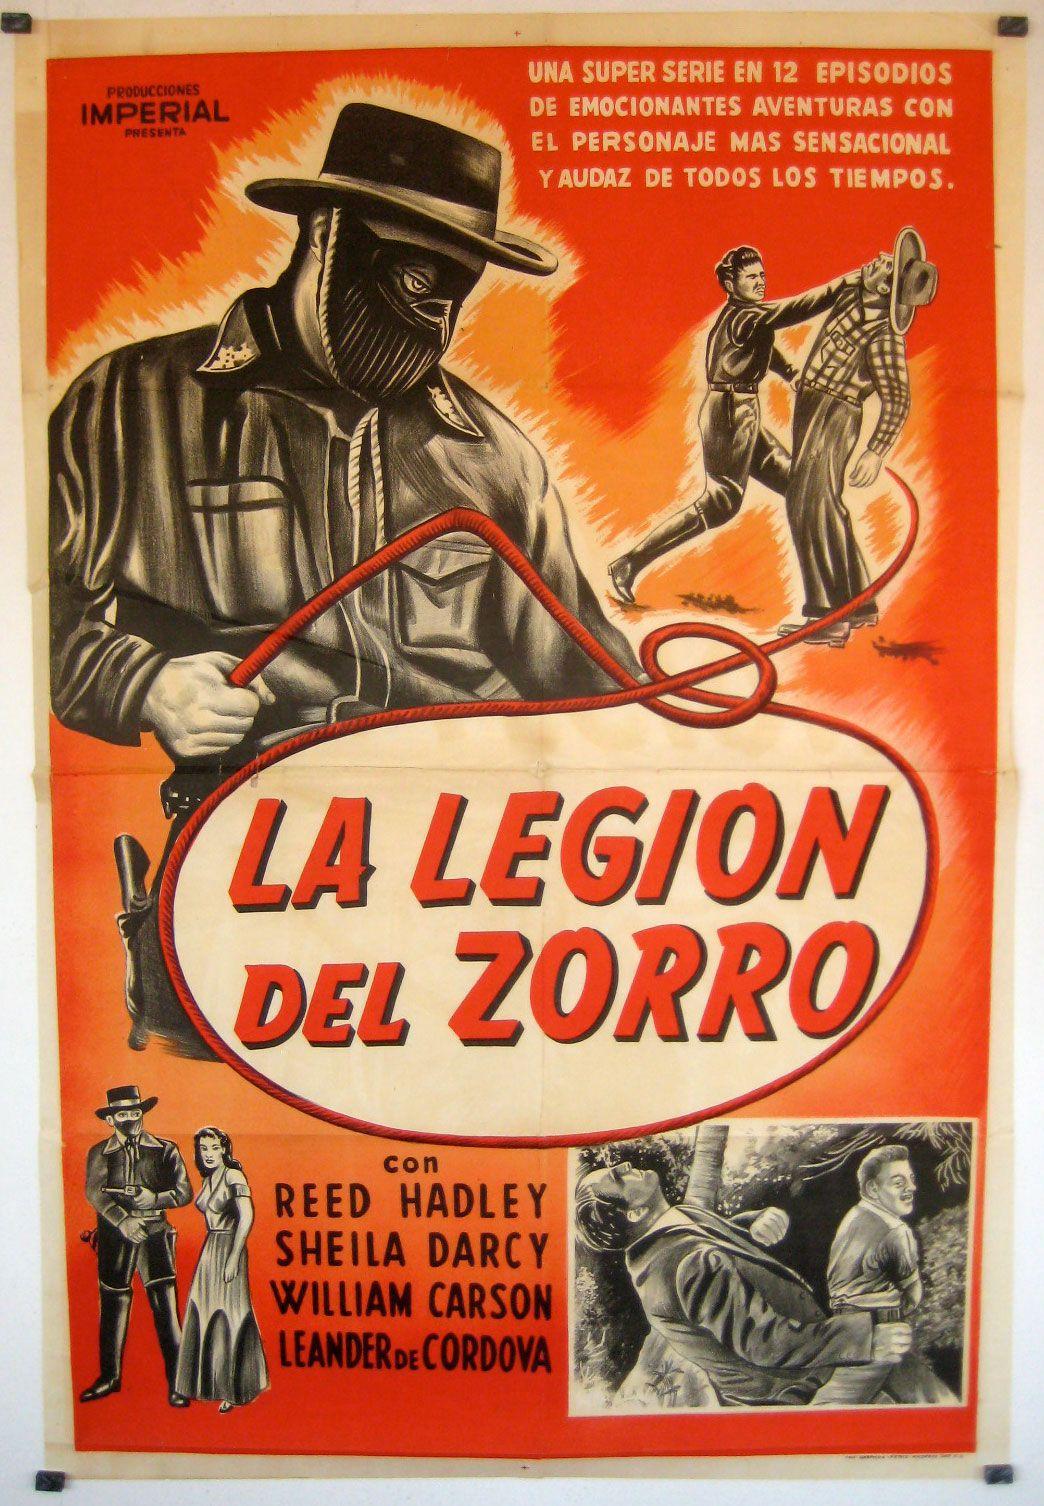 Zorros Fighting Legion 1939 Zorro